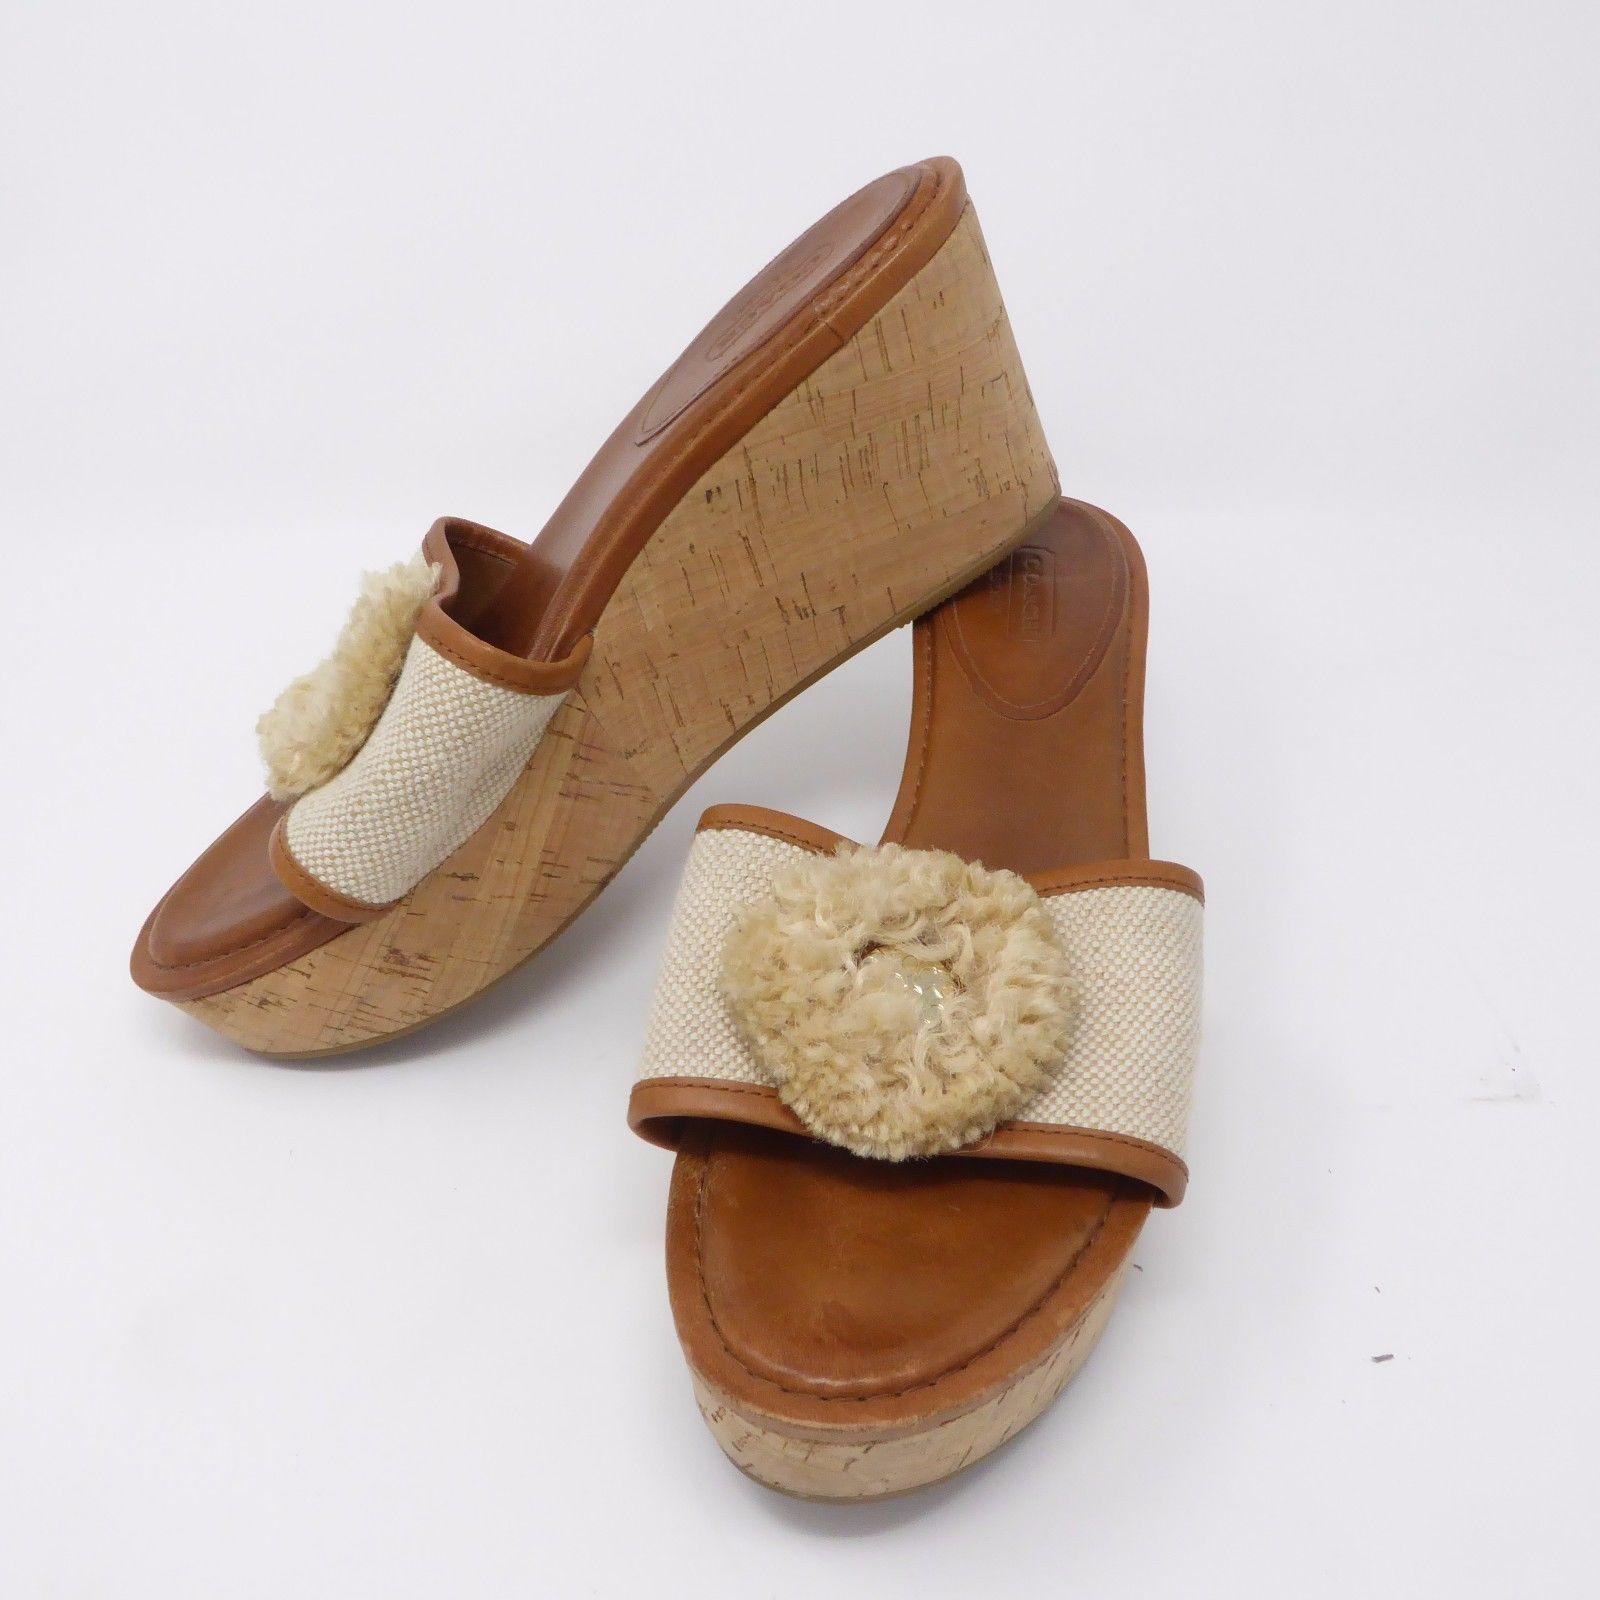 ca41df2262 Size 10 B COACH Platform Wedge Sandals Cork and 50 similar items